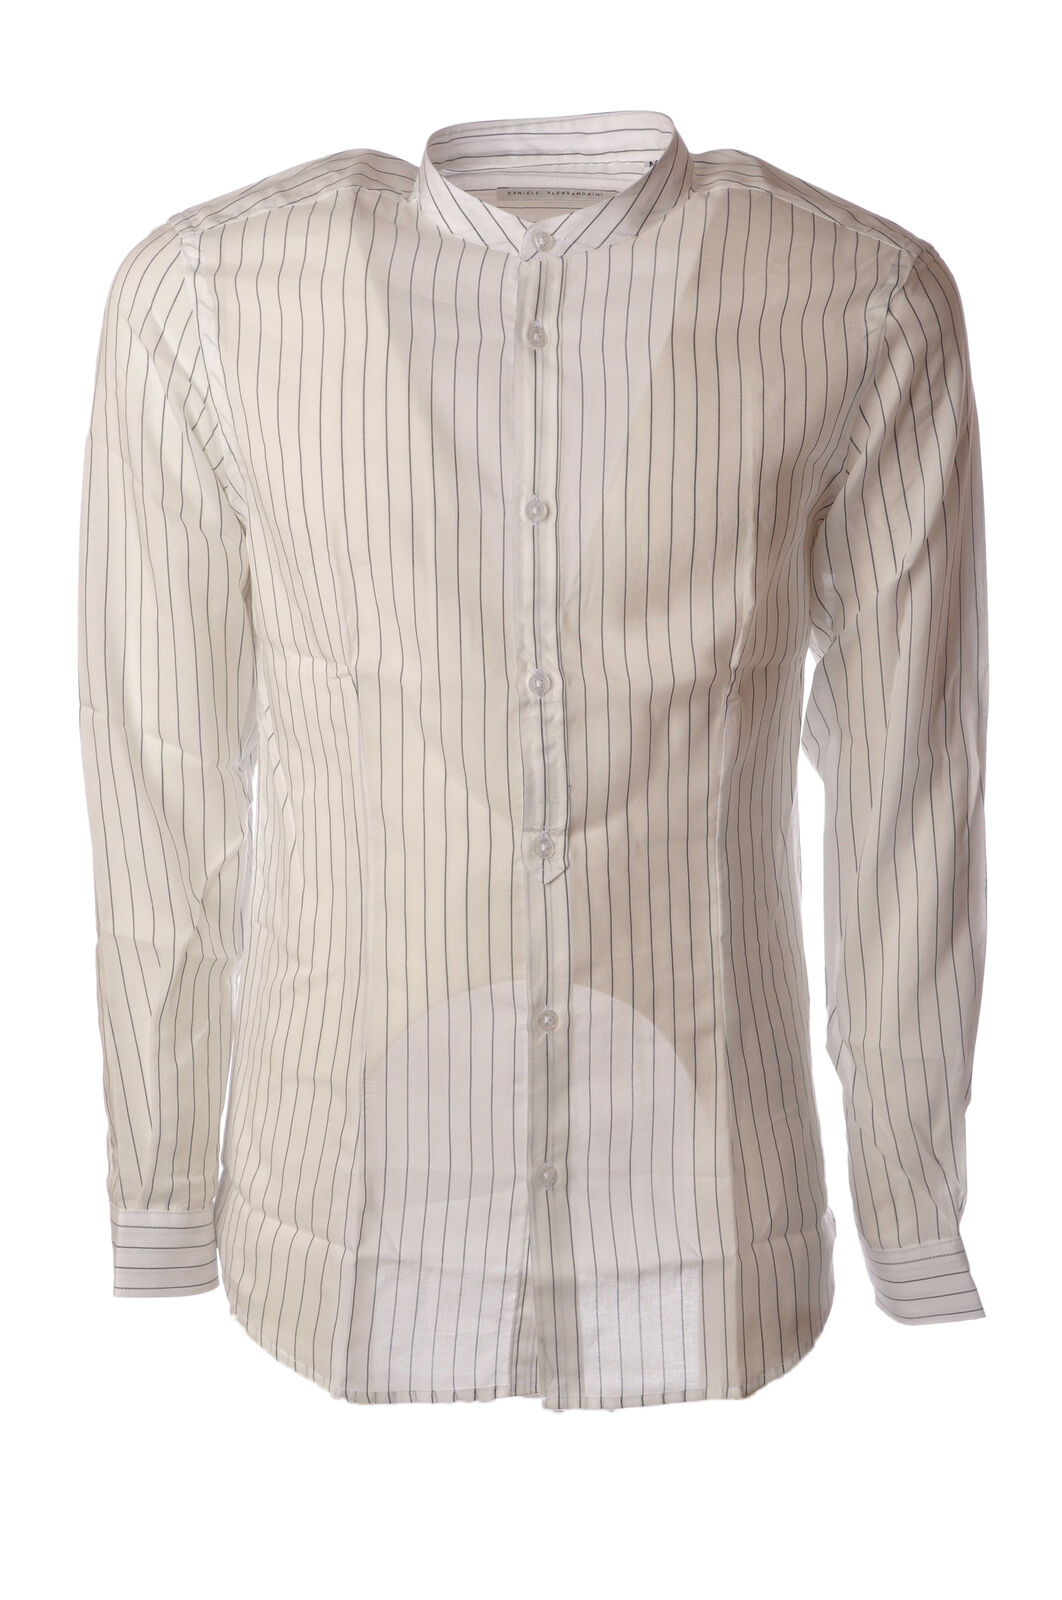 Daniele Alessandrini - Shirts-Shirt - Man - Weiß - 5043815G184030